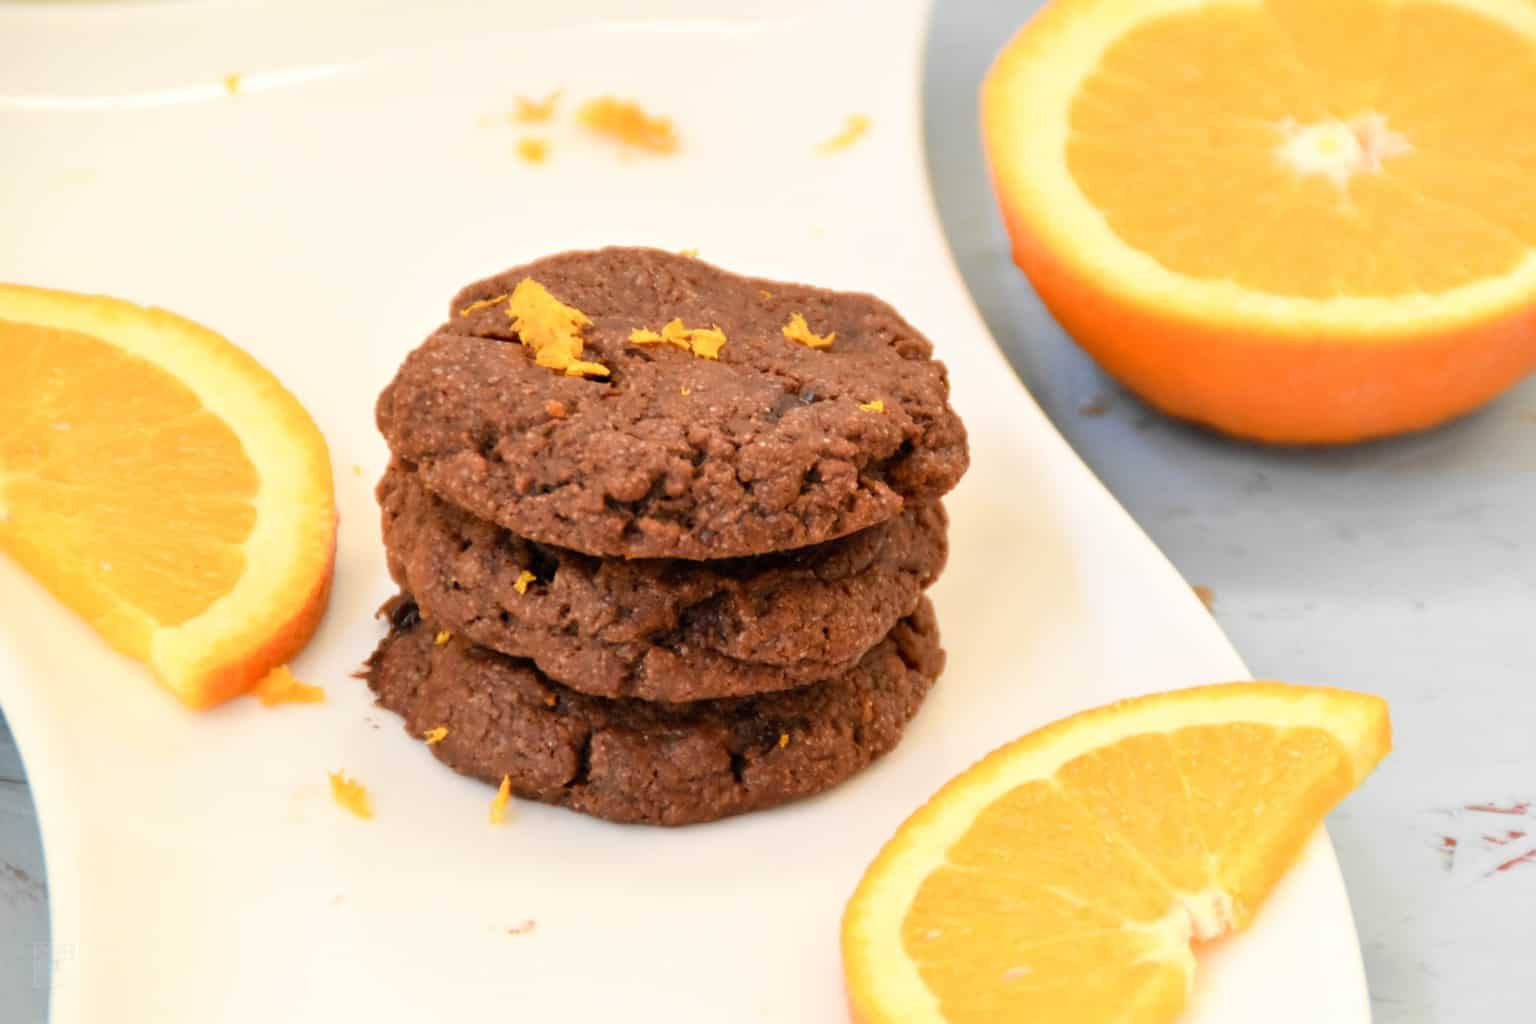 "<img src=""https://cdn.shortpixel.ai/client/q_glossy,ret_img,w_4096,h_2730/Vegan double chocolate orange cookies.jpg"" alt=""Vegan double chocolate orange cookies"">"